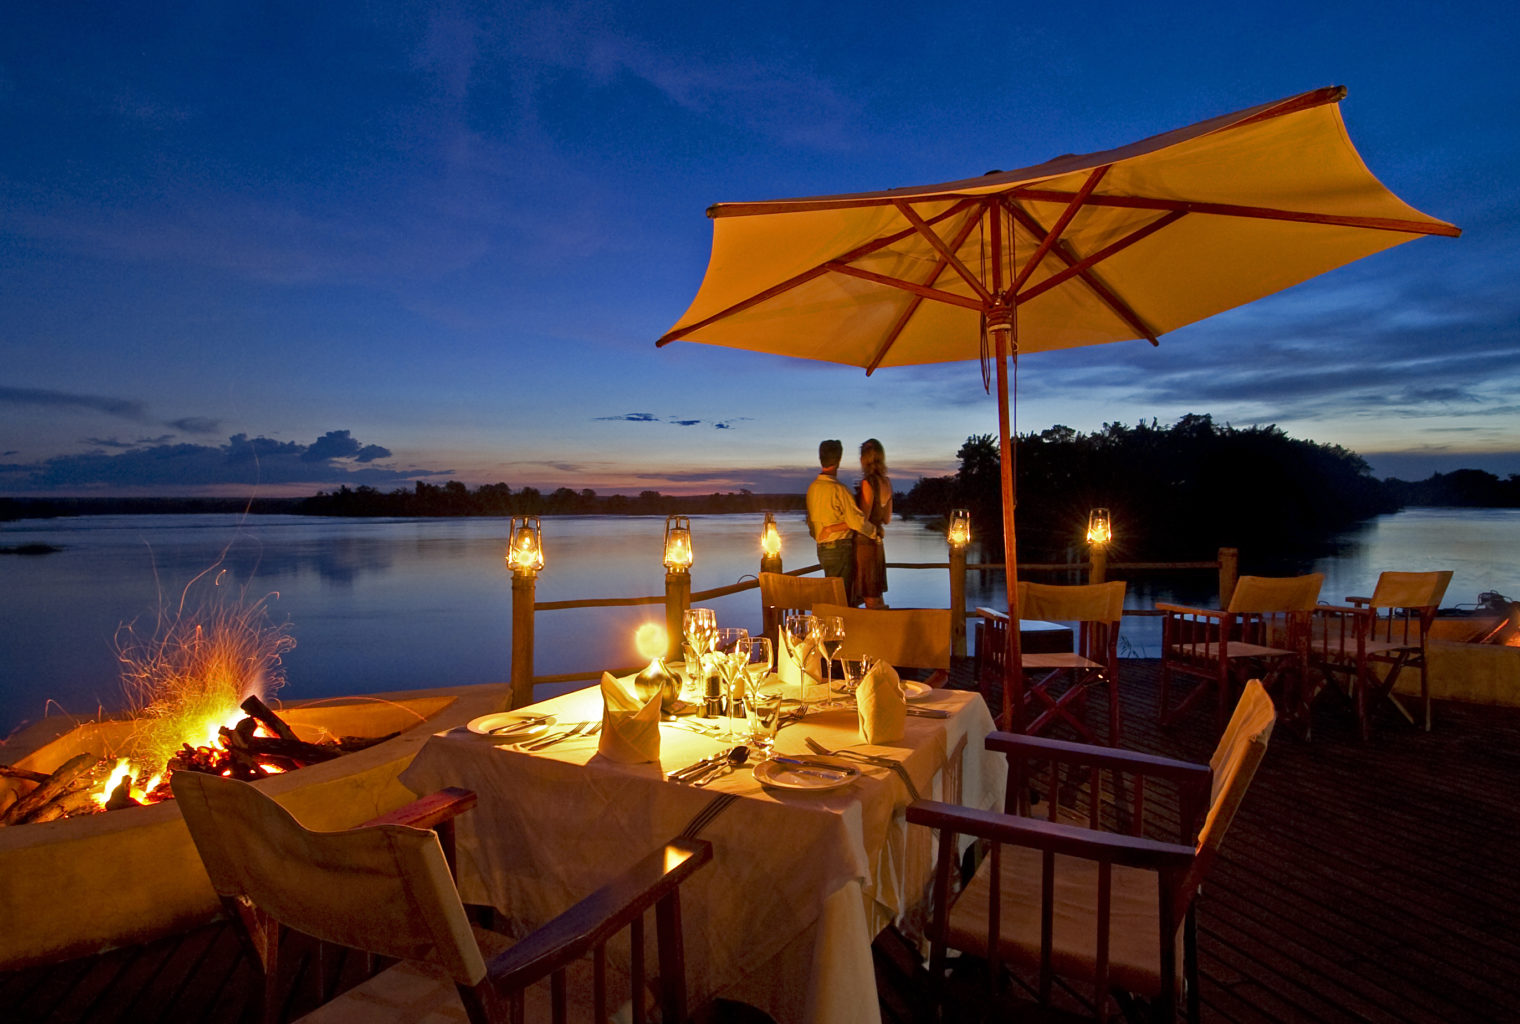 Sussi-and-chuma-zambia-bedroom sunset